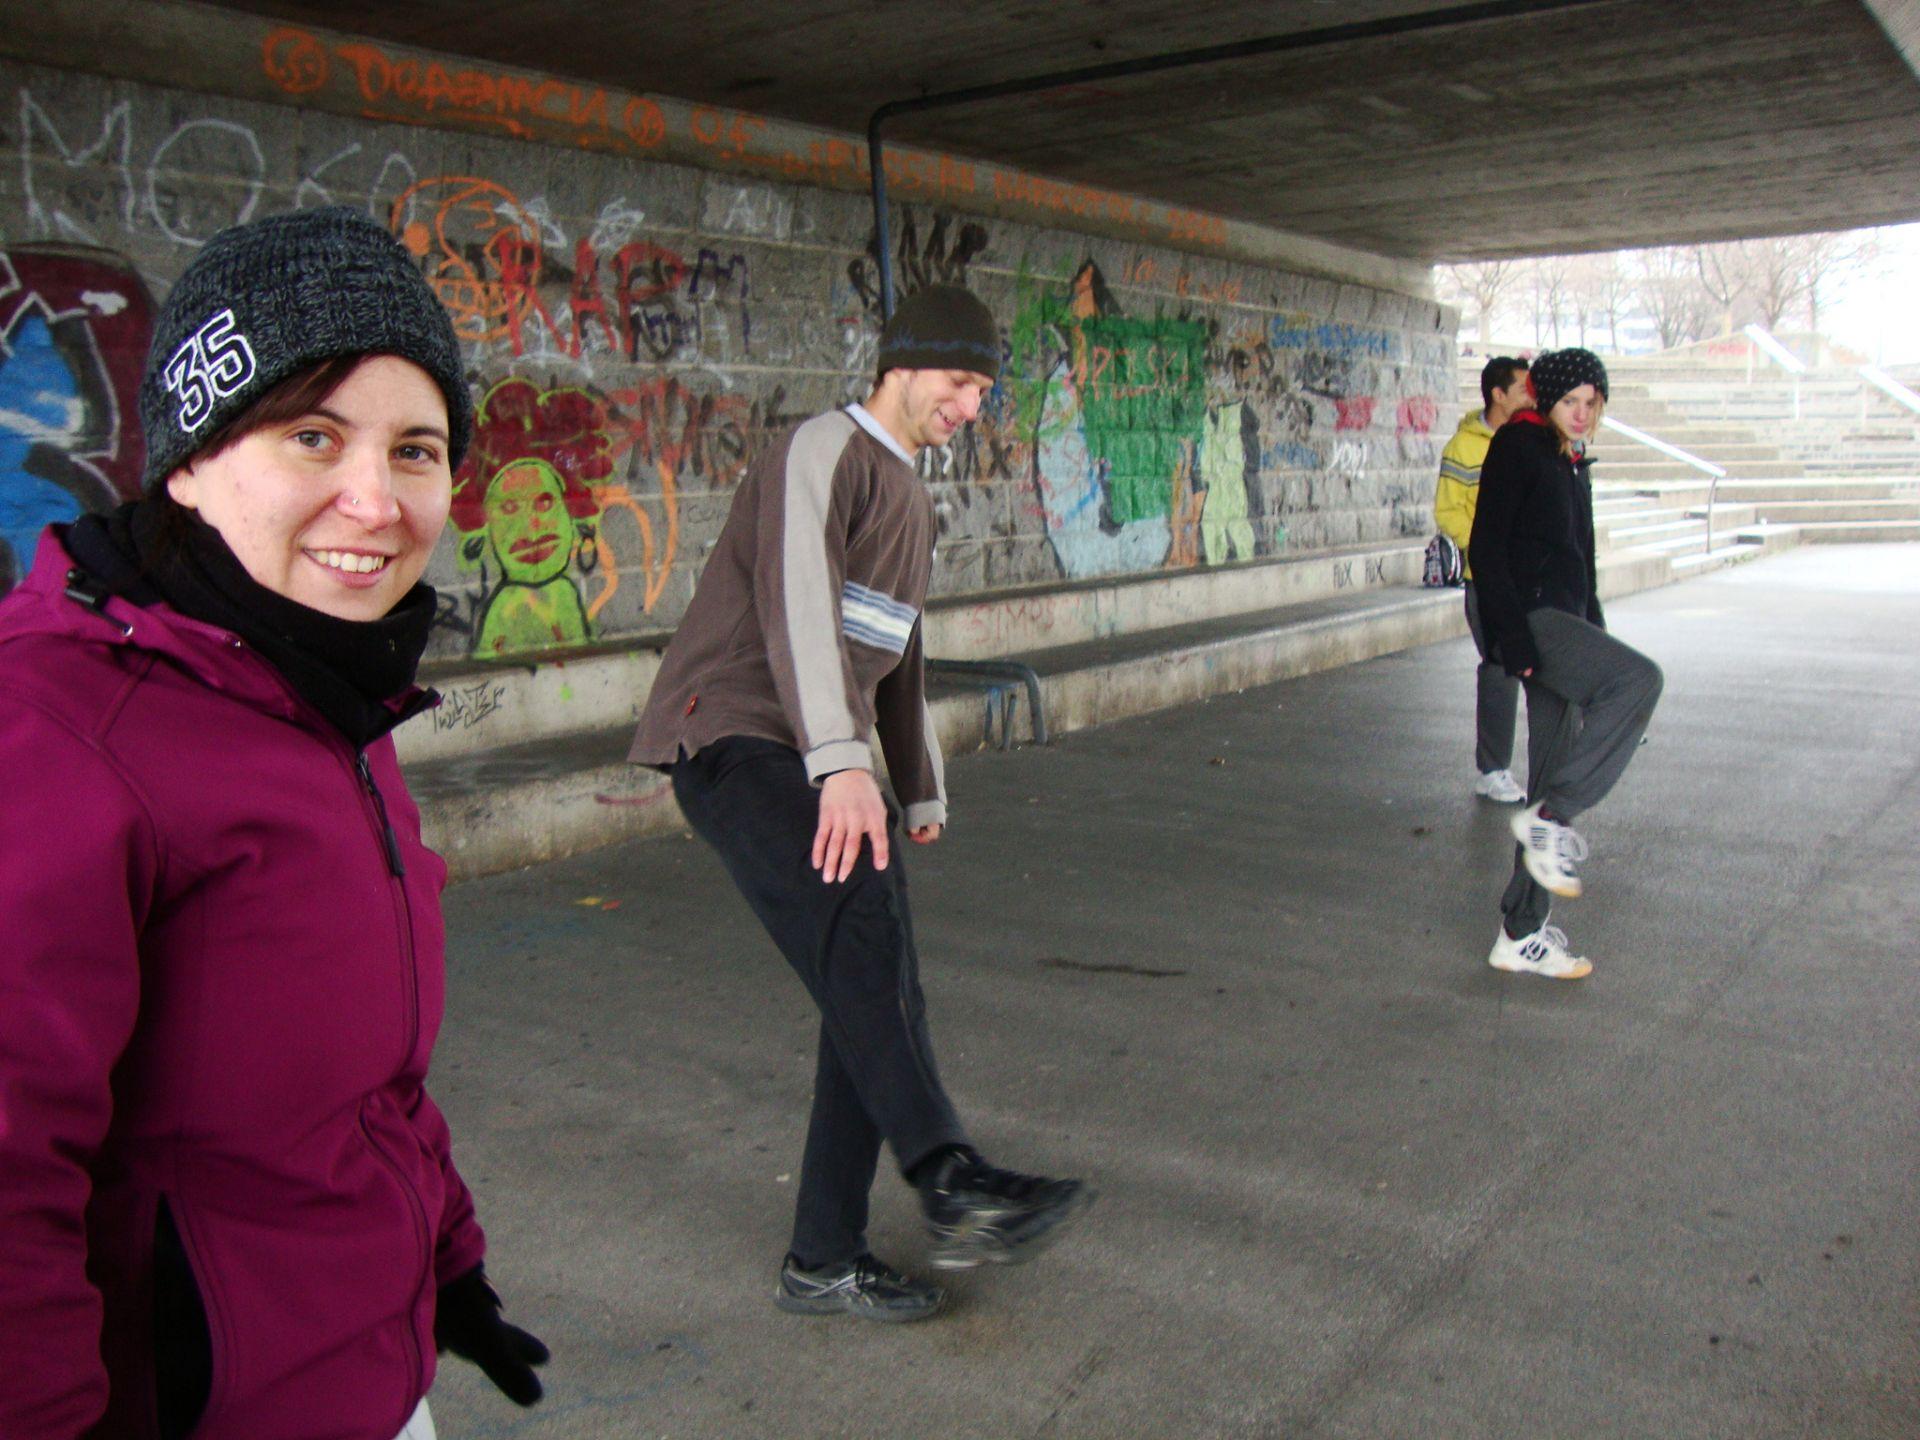 2013.03.24 FM Donauinsel